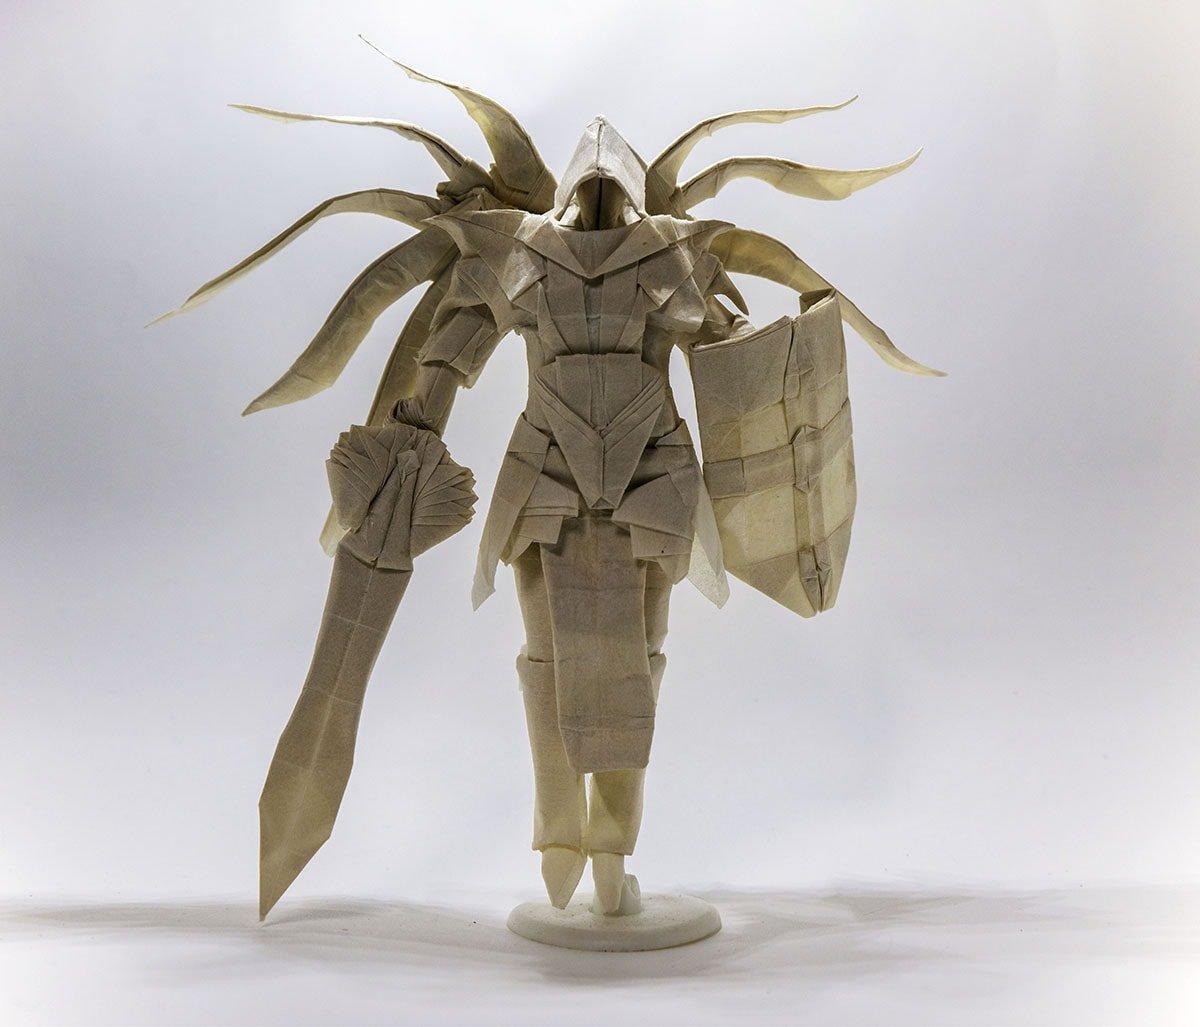 Tyrael from Diablo